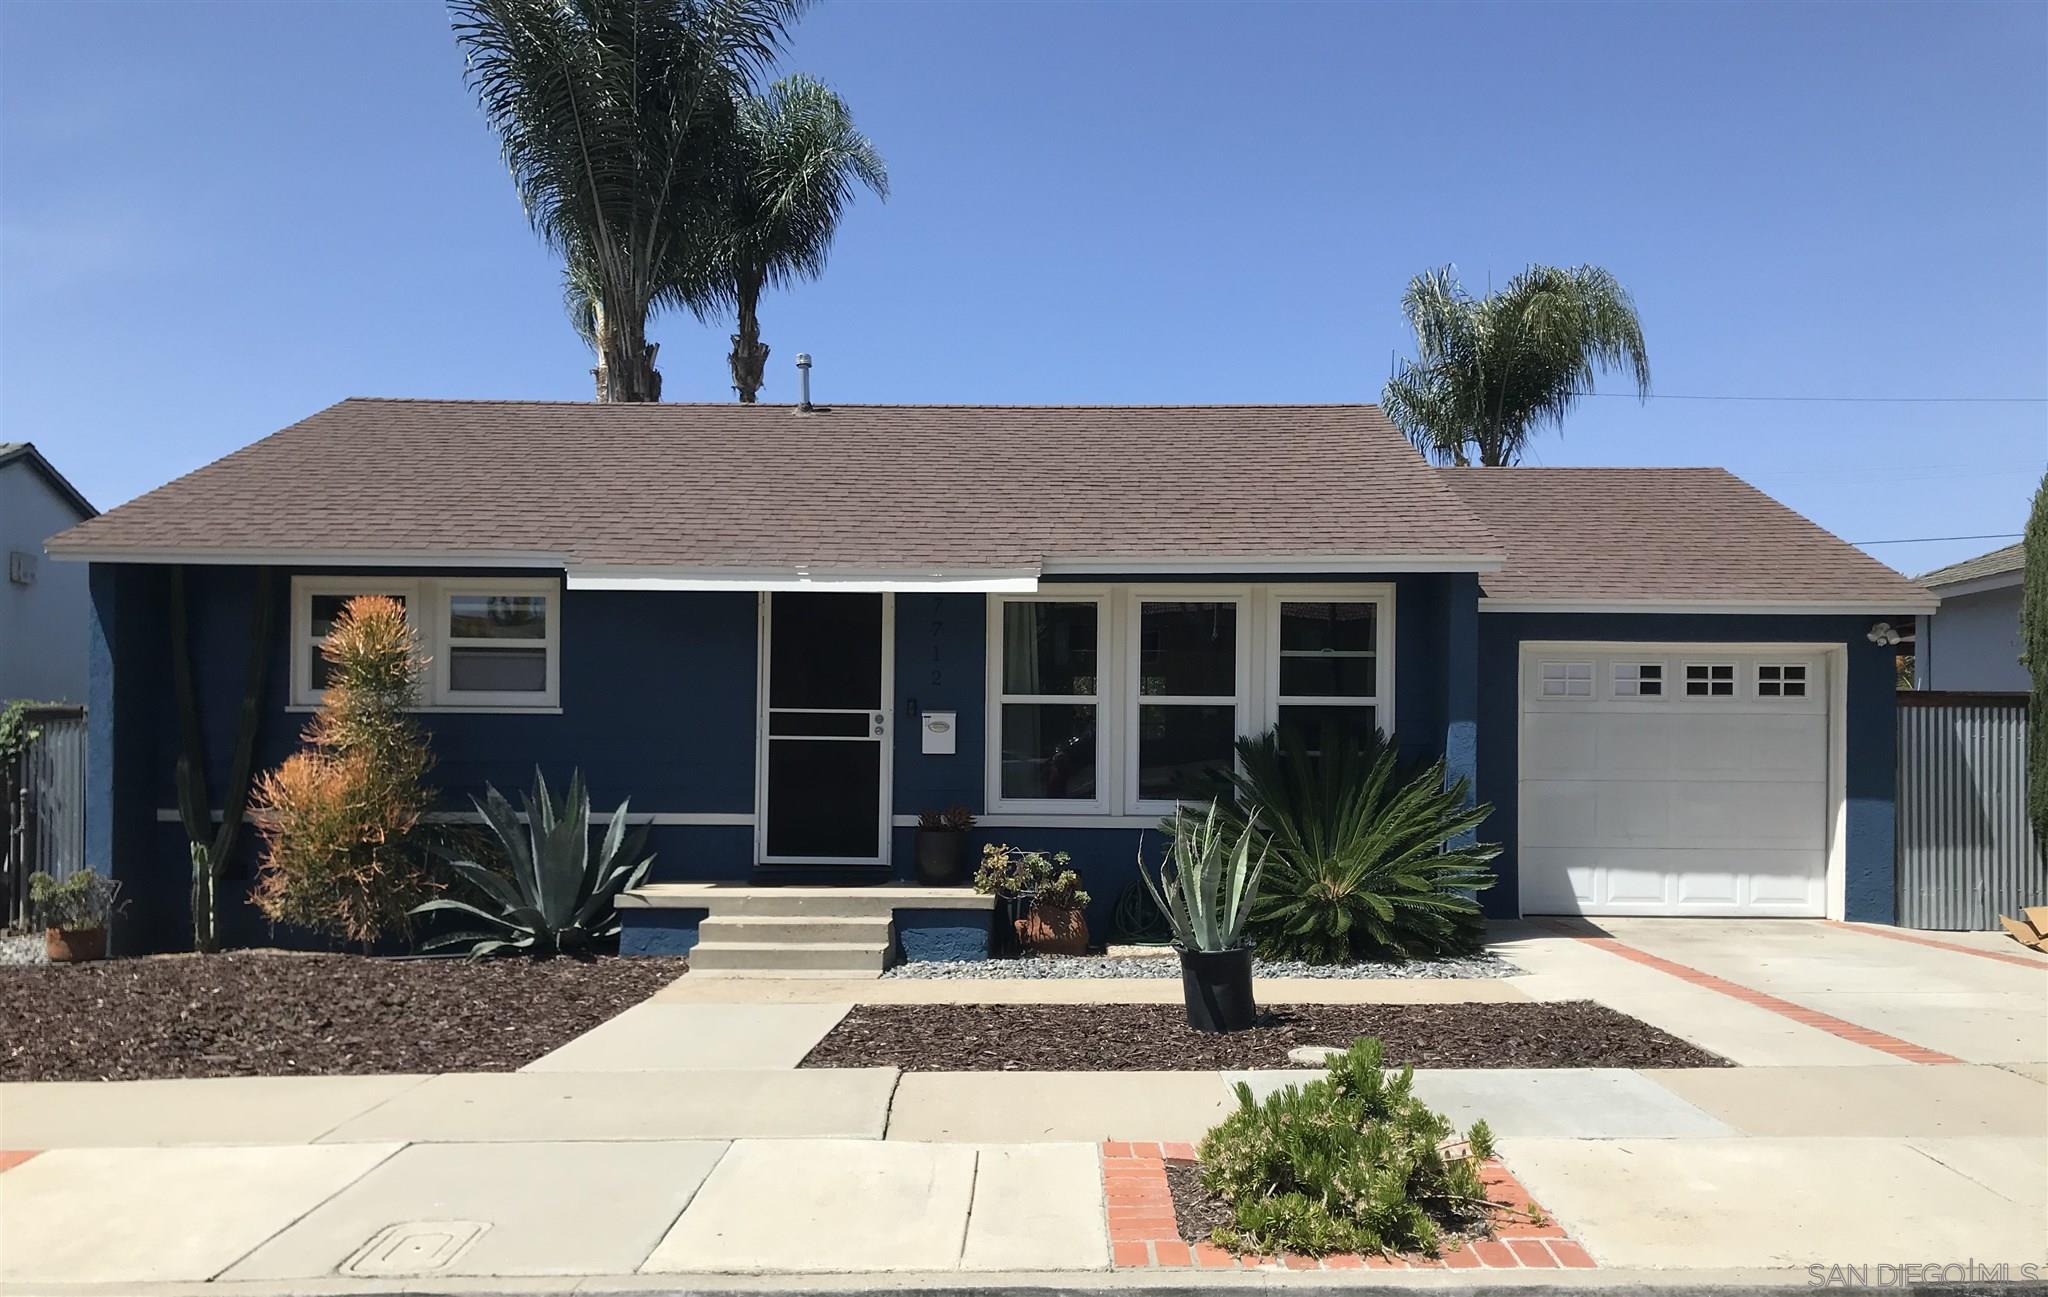 7712 Linda Vista Road, San Diego, CA 92111